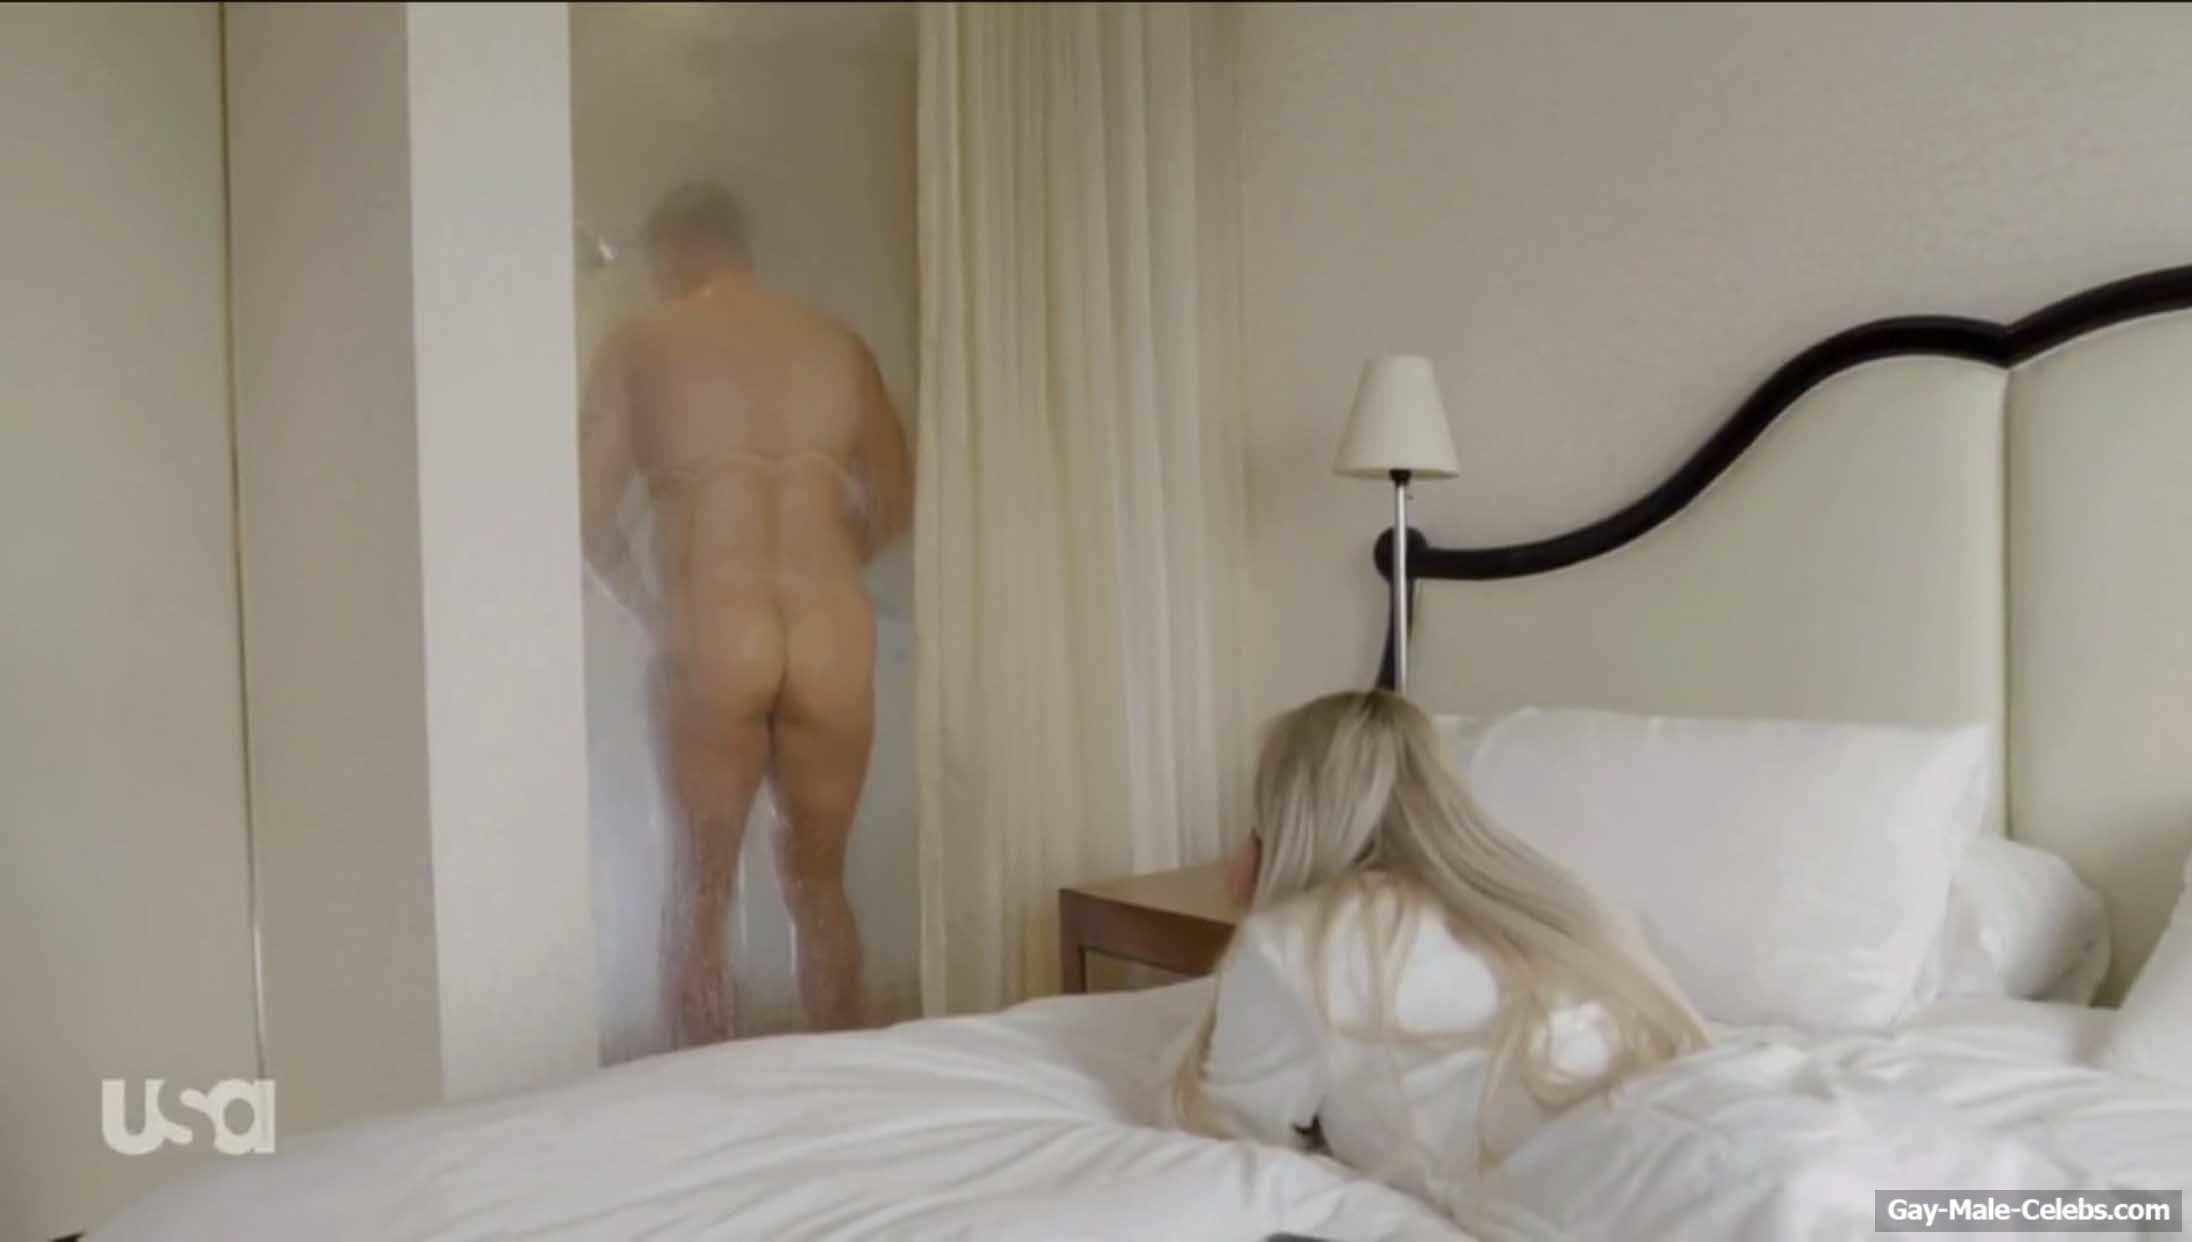 Shameless male nude scenes